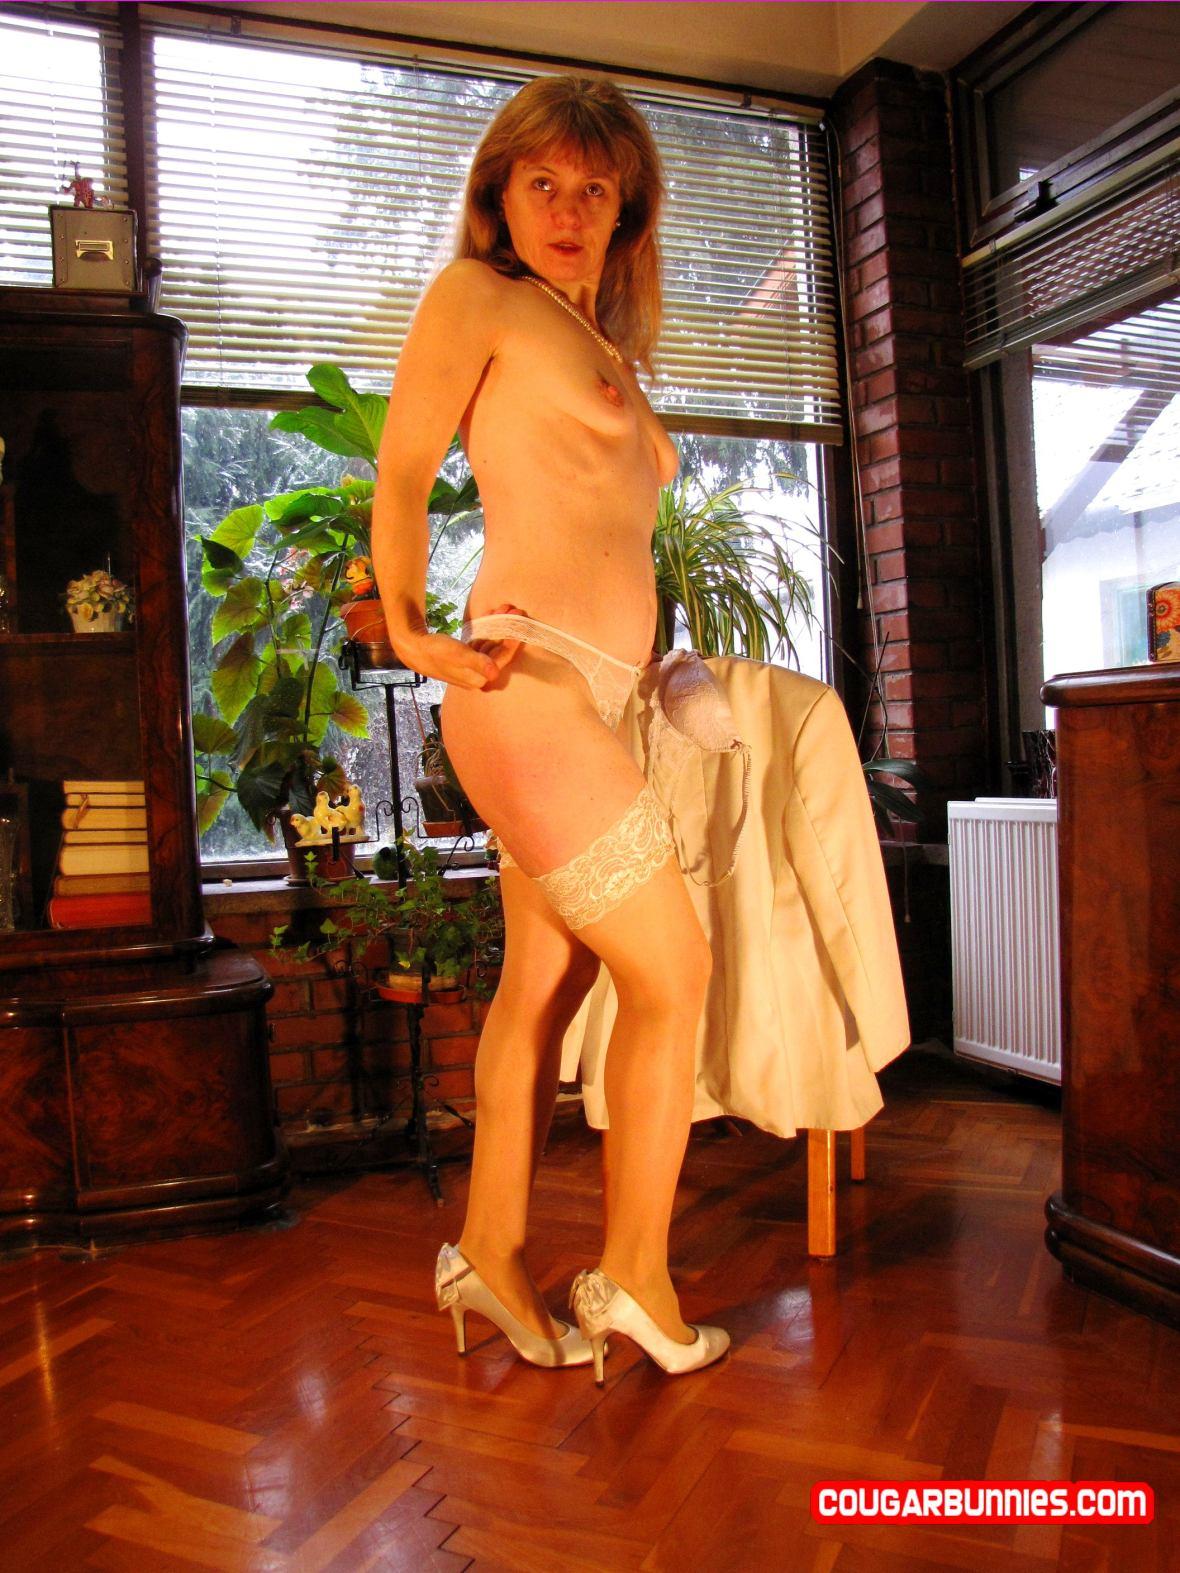 White coat, white lingerie - on CougarBunnies.com